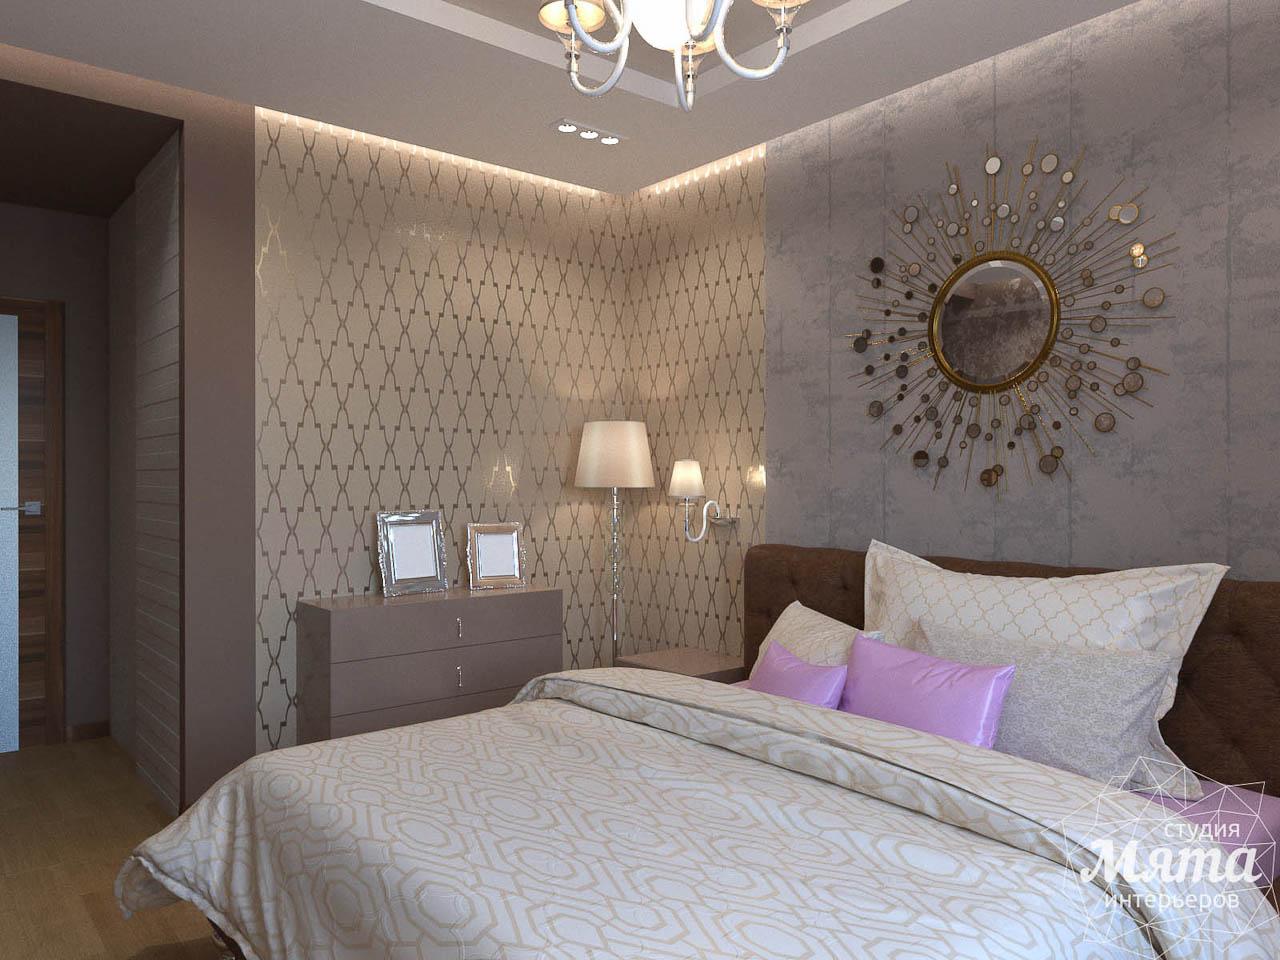 Дизайн интерьера трехкомнатной квартиры по ул. Мельникова 27 img142597037